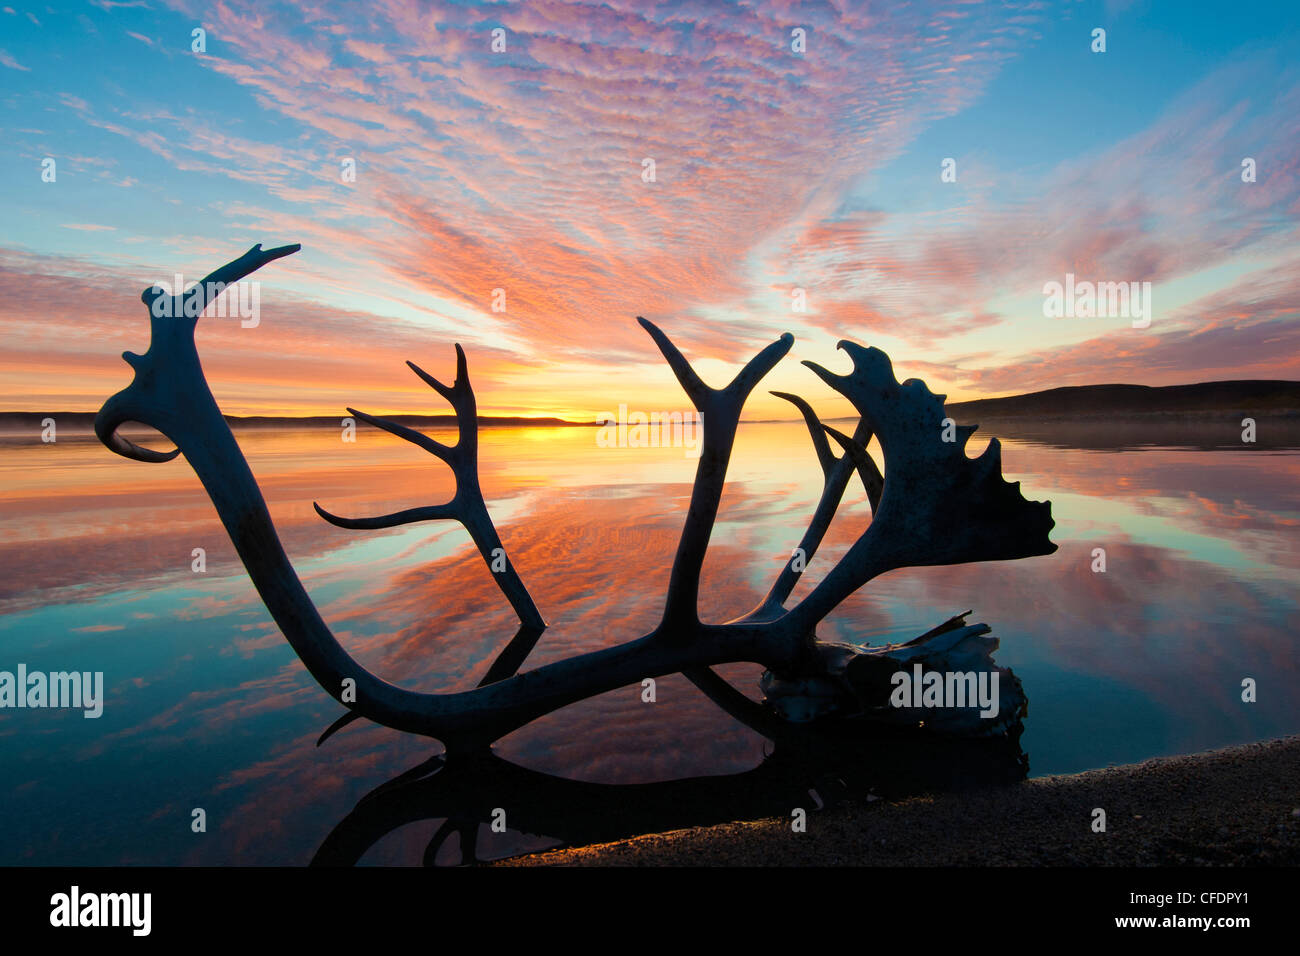 Caribou Geweih (Rangifer Tarandus) und Herbst Sonnenaufgang, Barrenlands, zentrale Nordwest-Territorien, arktischen Stockfoto